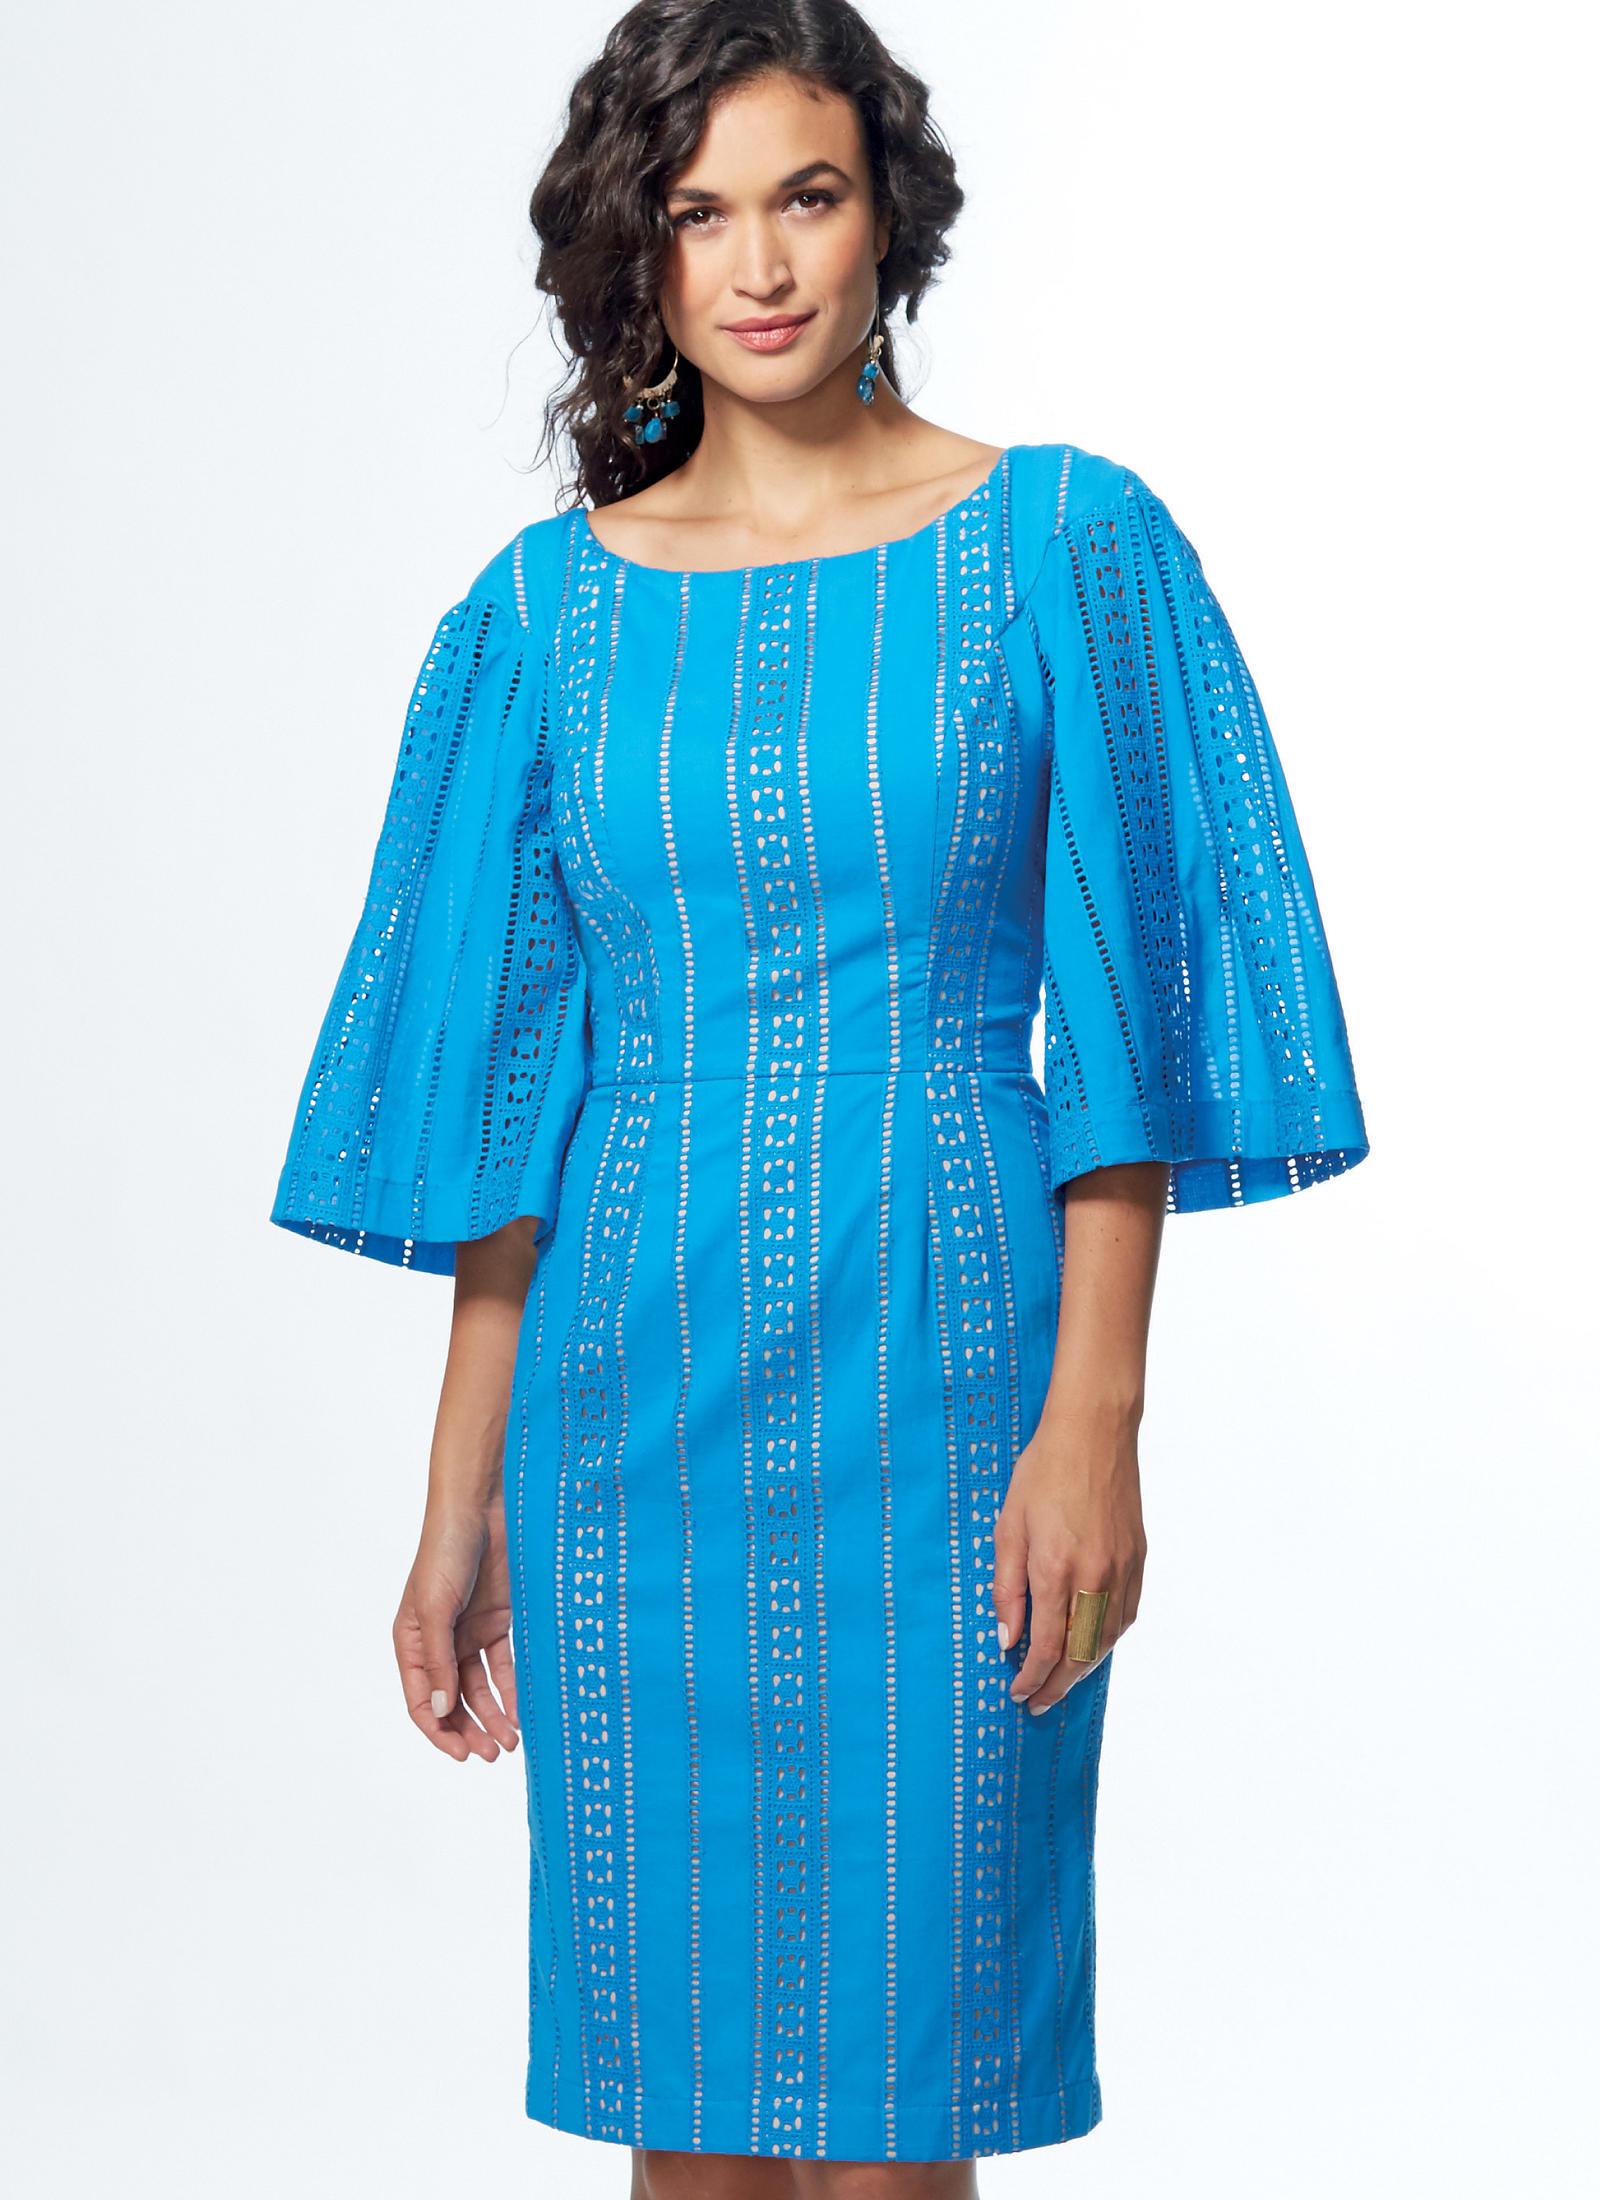 Vogue Patterns 9239 MISSES' PRINCESS SEAM DRESSES WITH